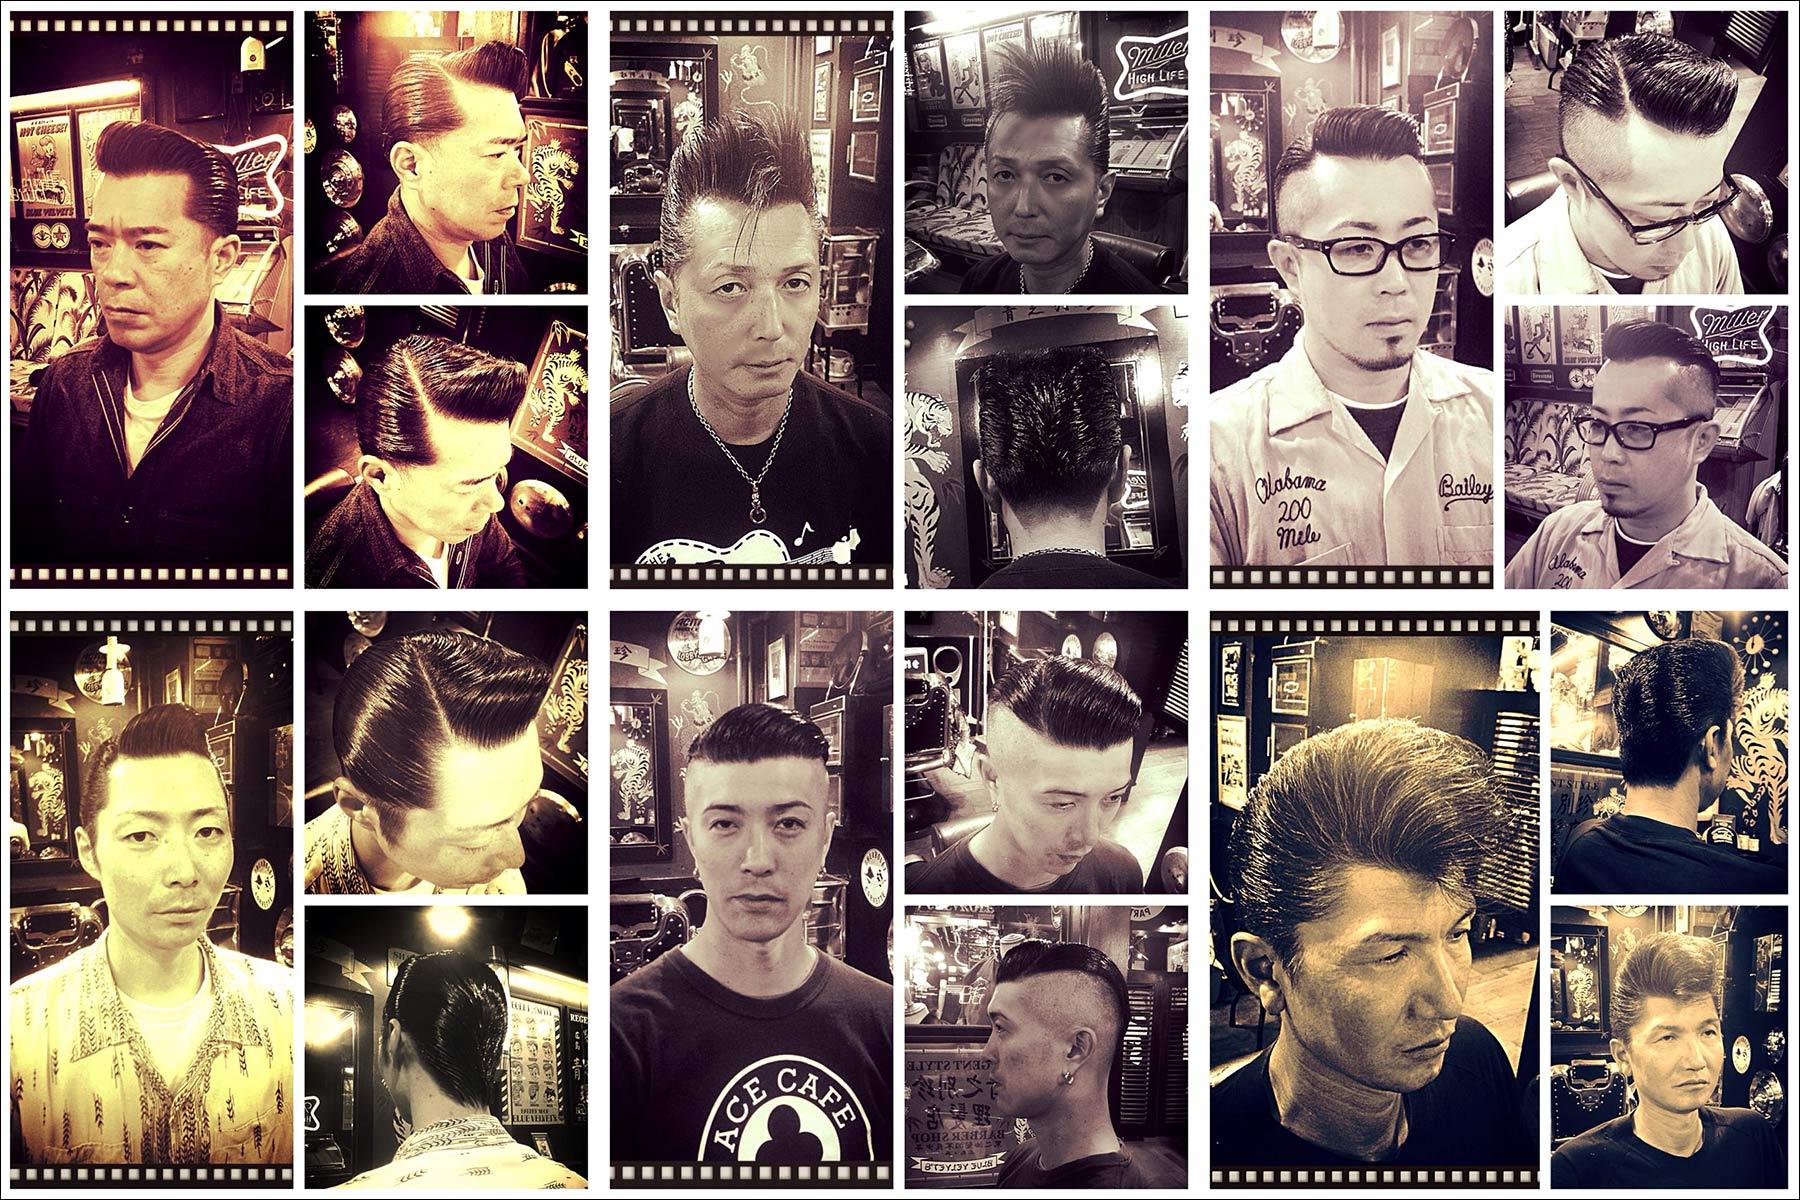 Portraits of Japanese men in perfectly groomed 1950s rockabilly pompadours from Blue Velvet's barber shop. Ponyboy magazine New York.